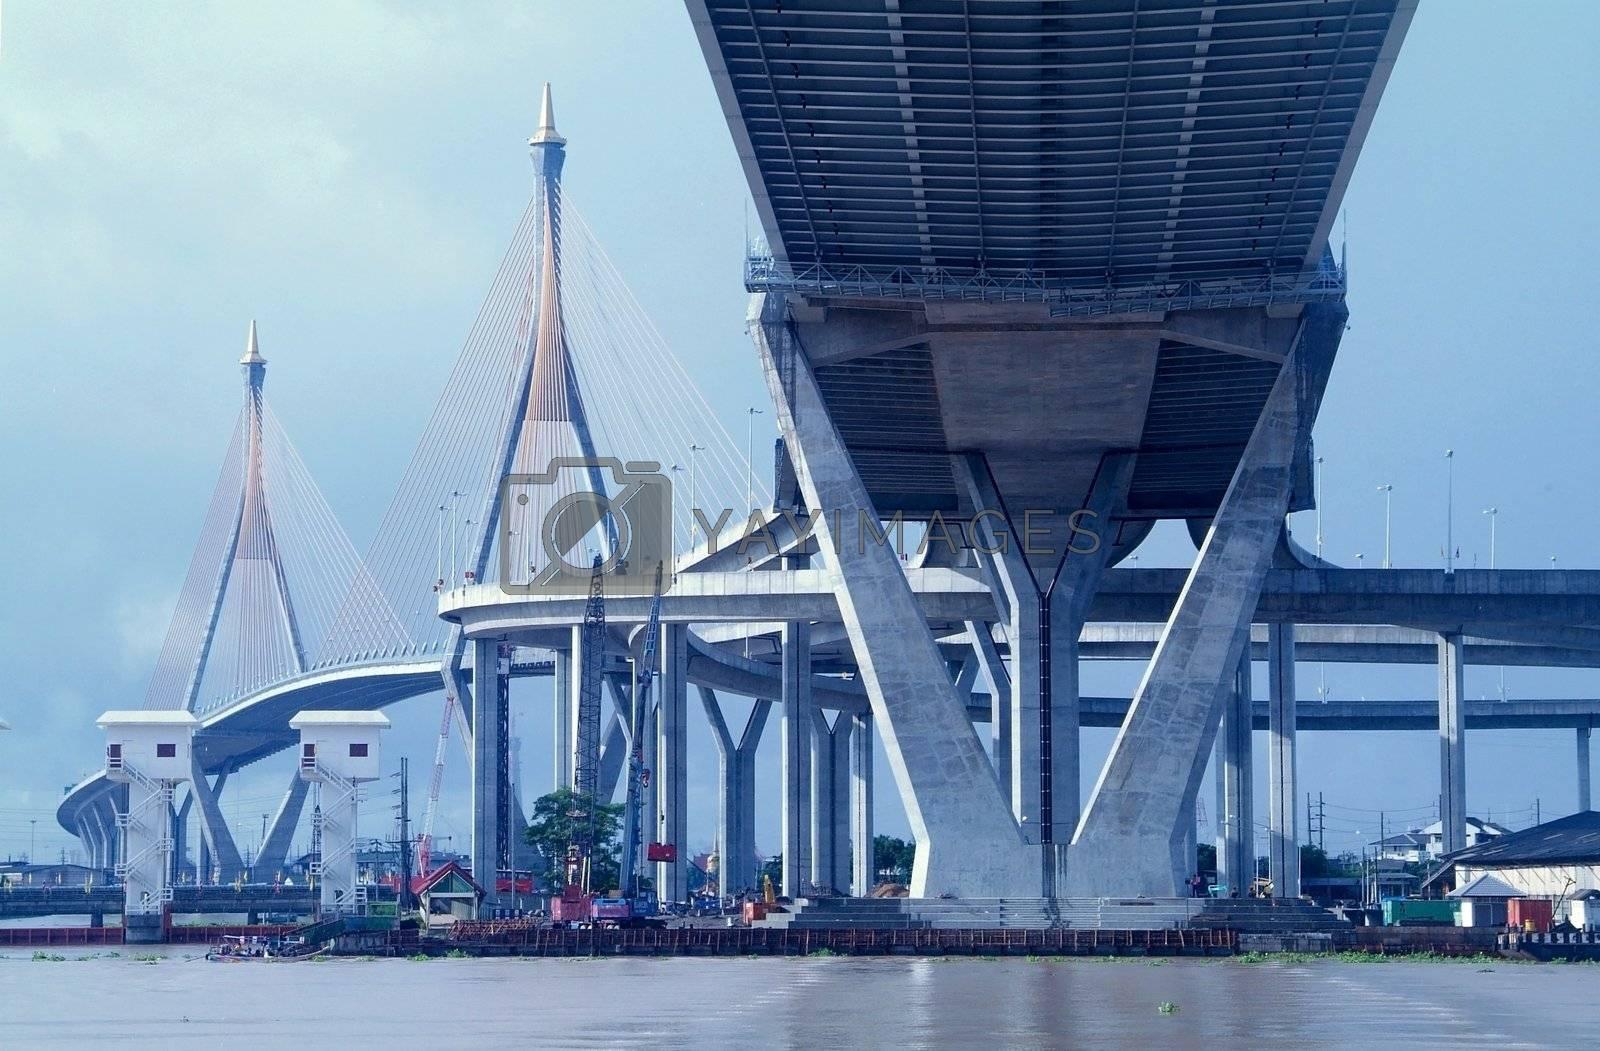 Royalty free image of Bridge in Bangkok, Thailand by epixx